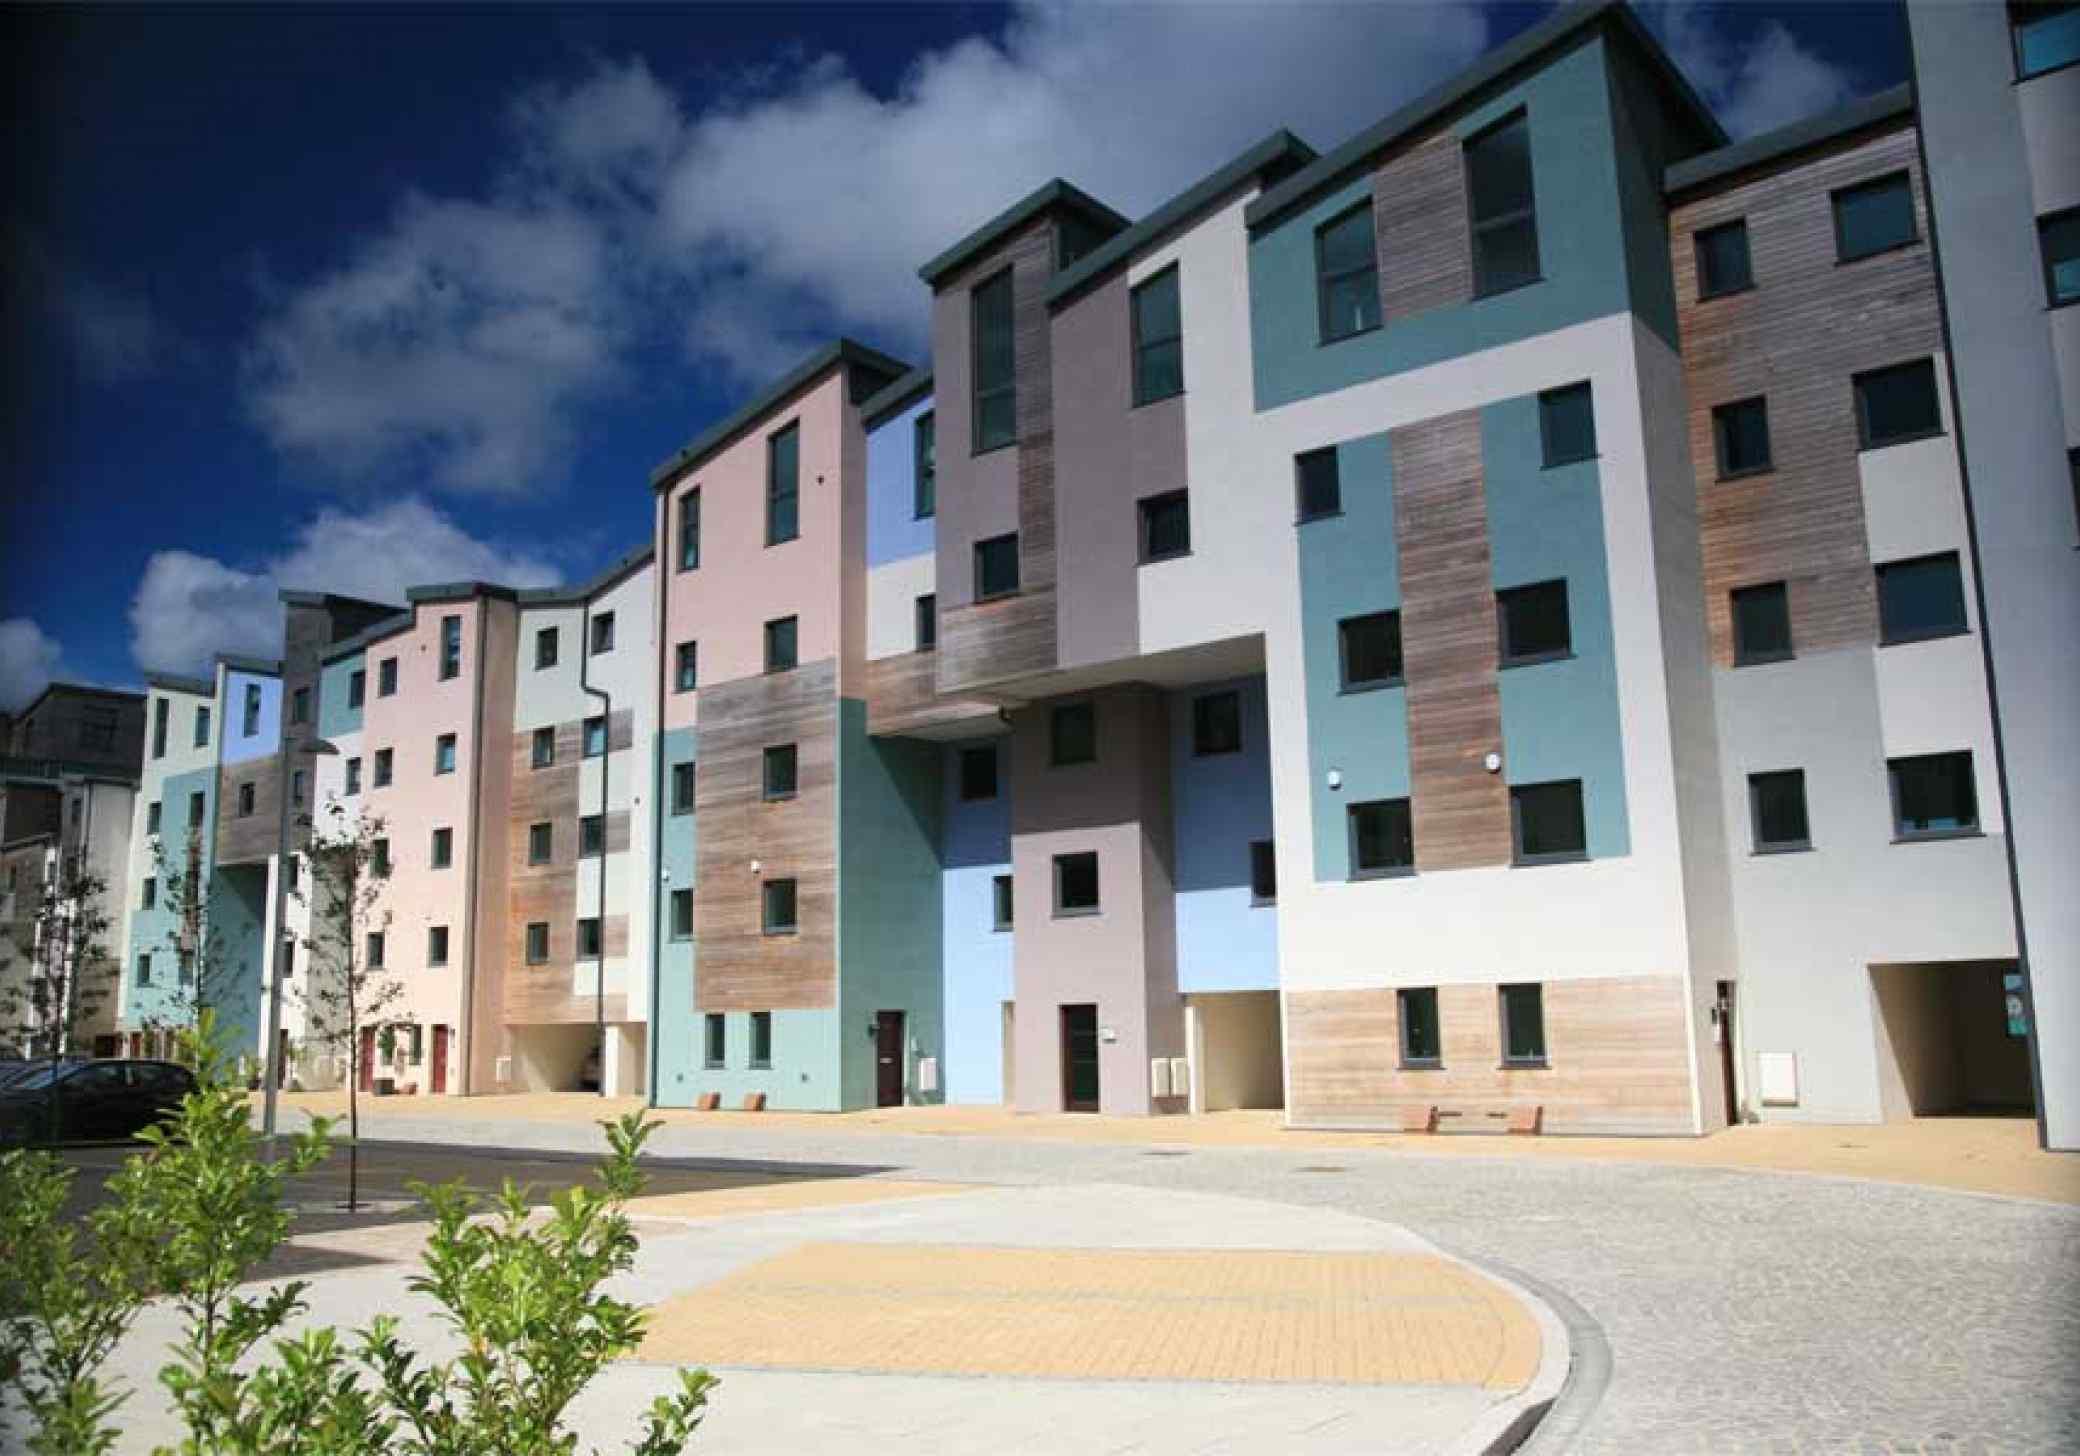 Victoria Dock Caernarfon residential apartments